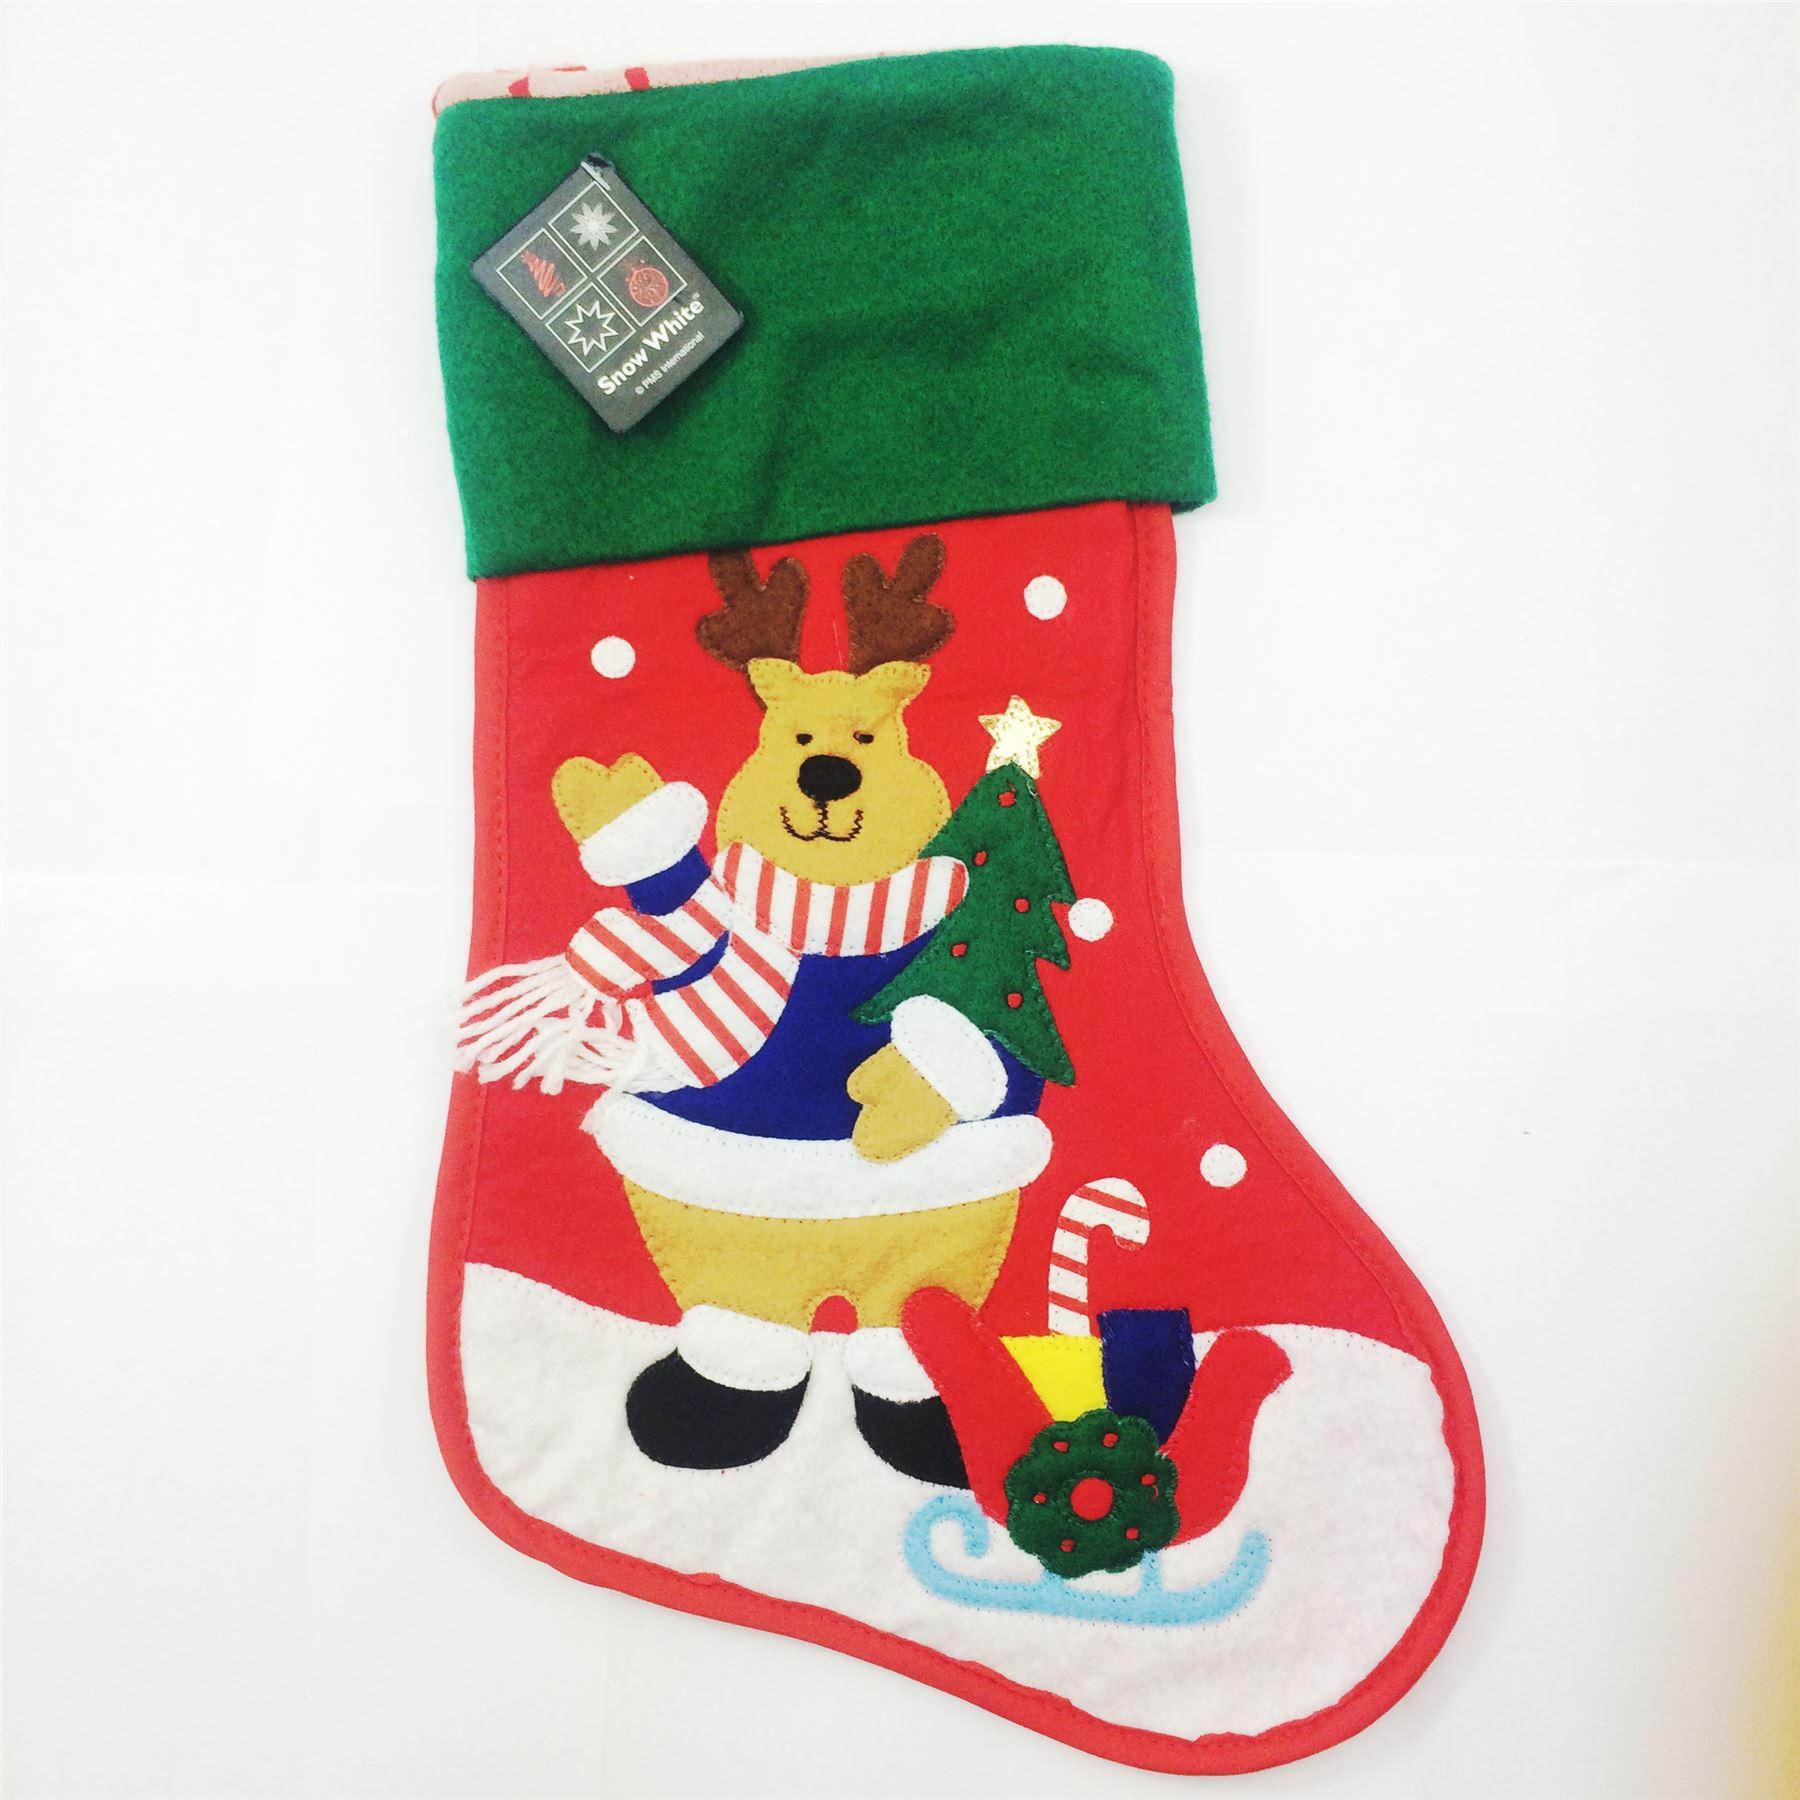 Festive christmas felt stitched stocking cute santa for Felt stocking decorations